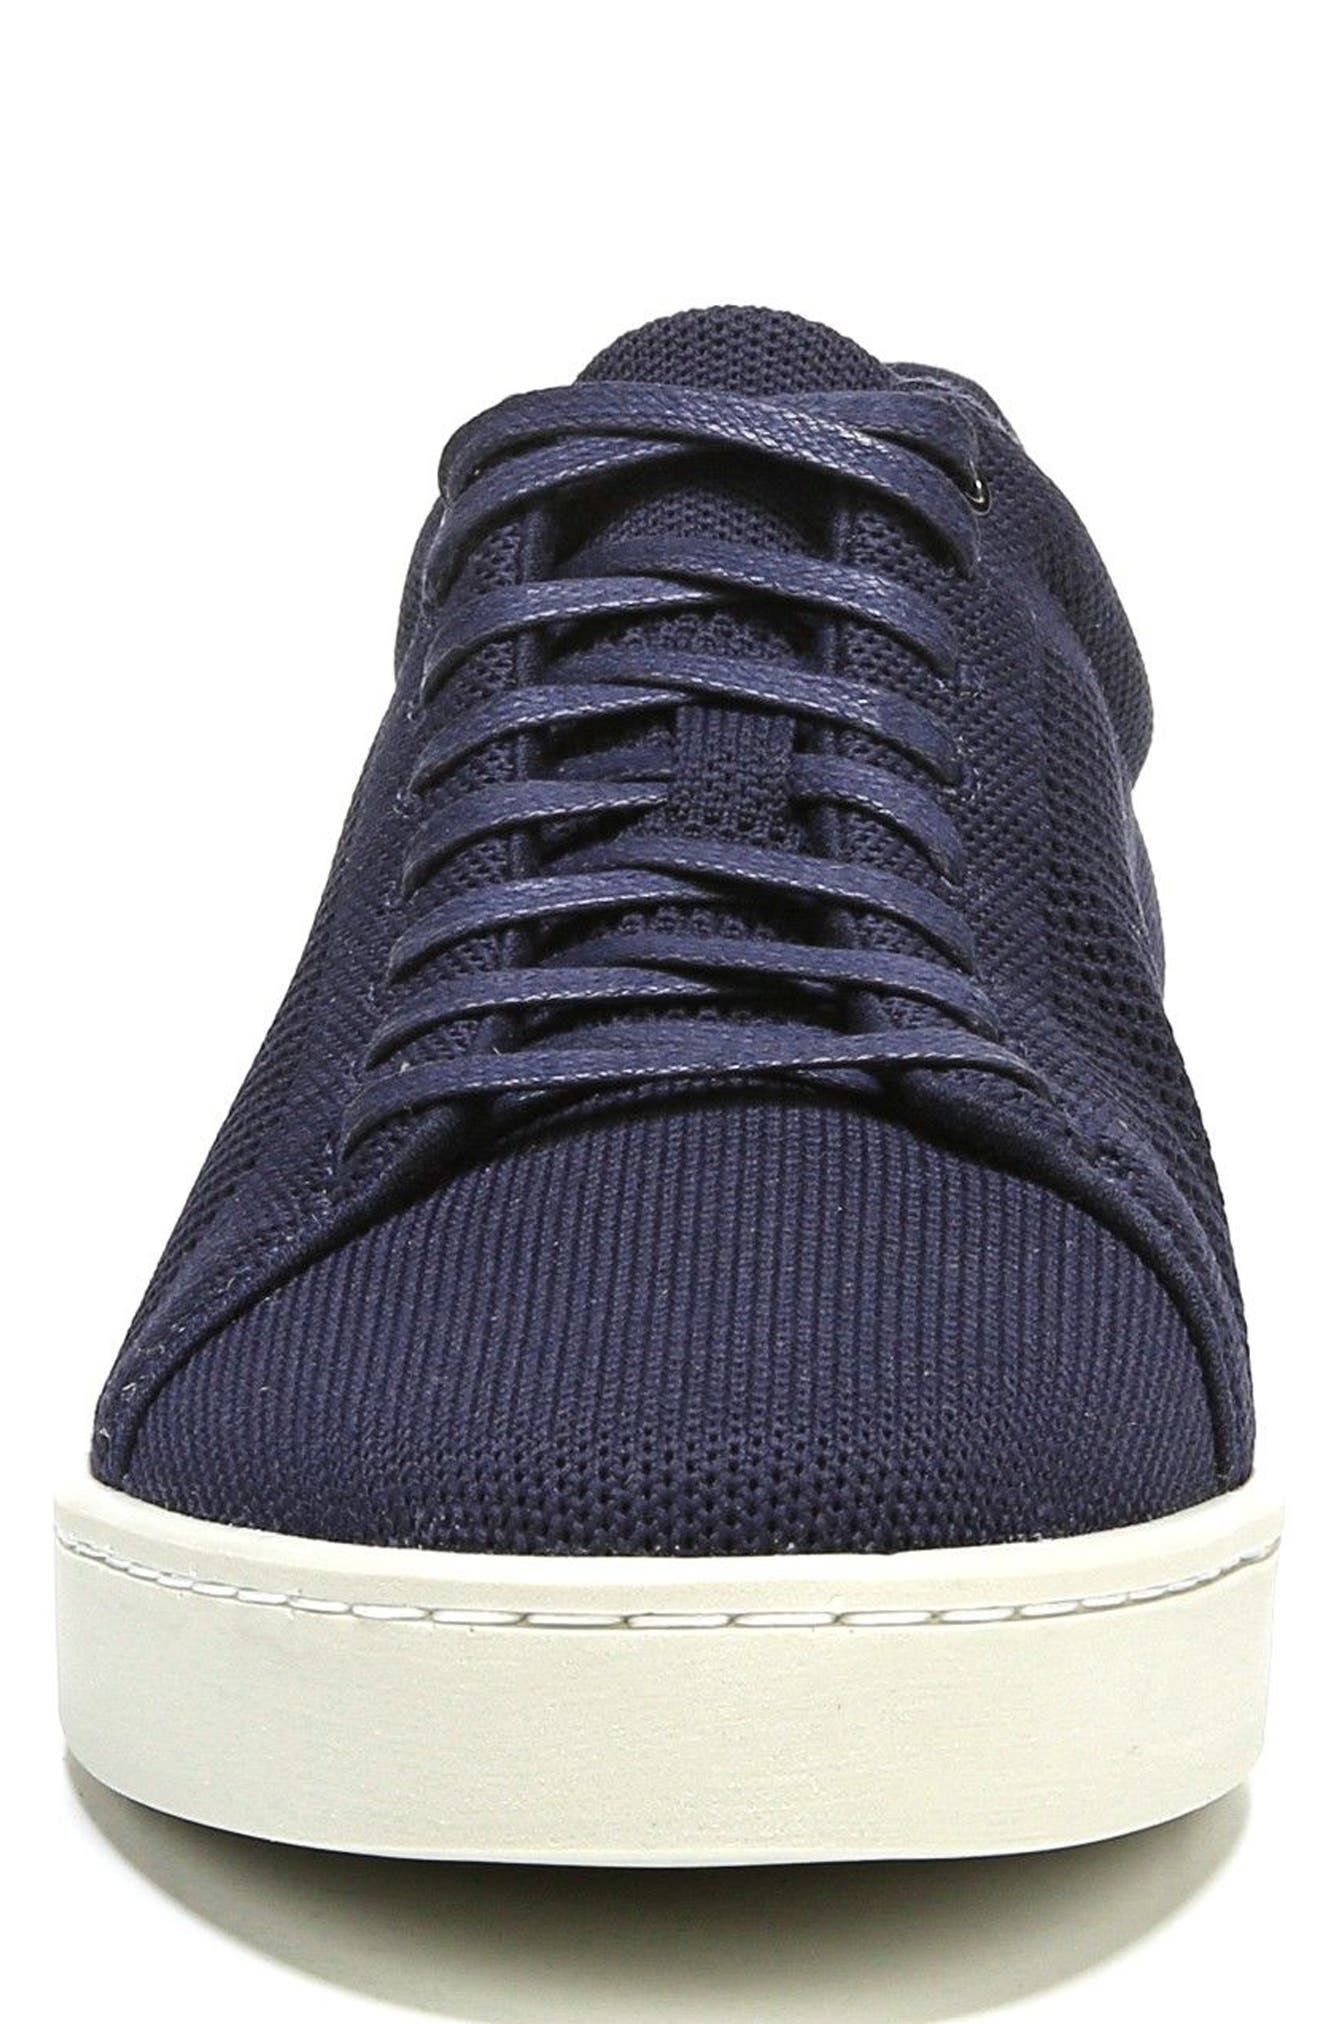 Silos Knit Low Top Sneaker,                             Alternate thumbnail 4, color,                             Coastal